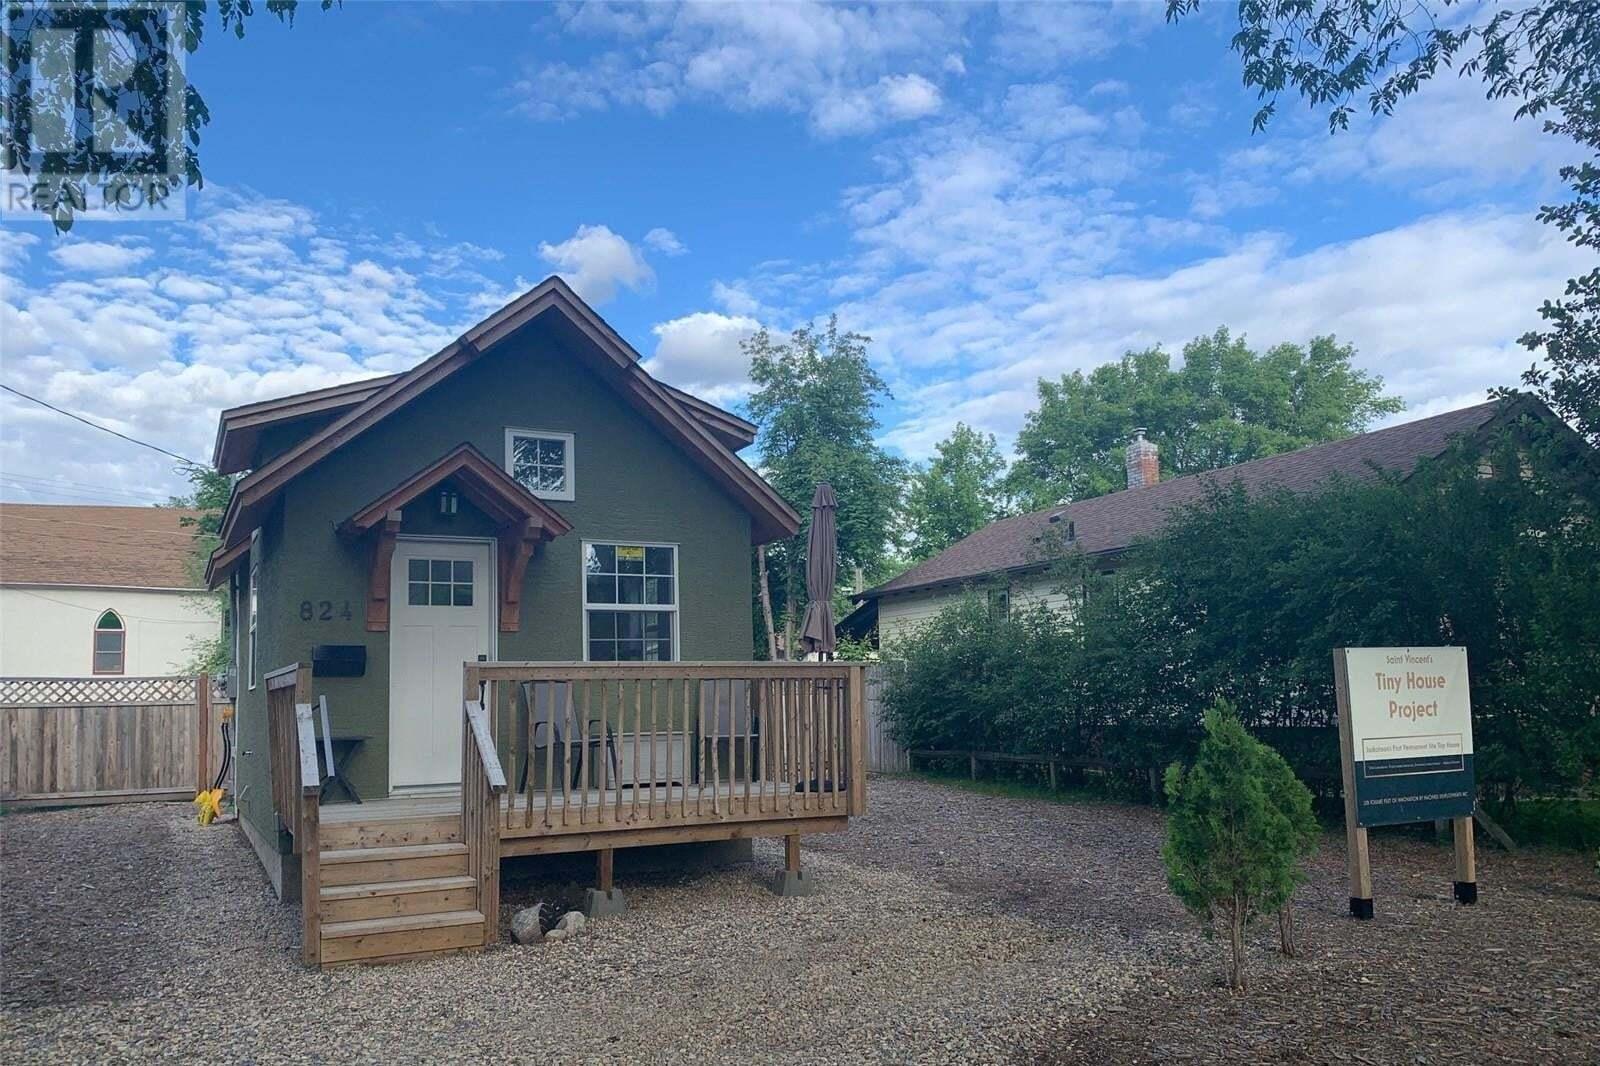 House for sale at 824 F Ave N Saskatoon Saskatchewan - MLS: SK813816